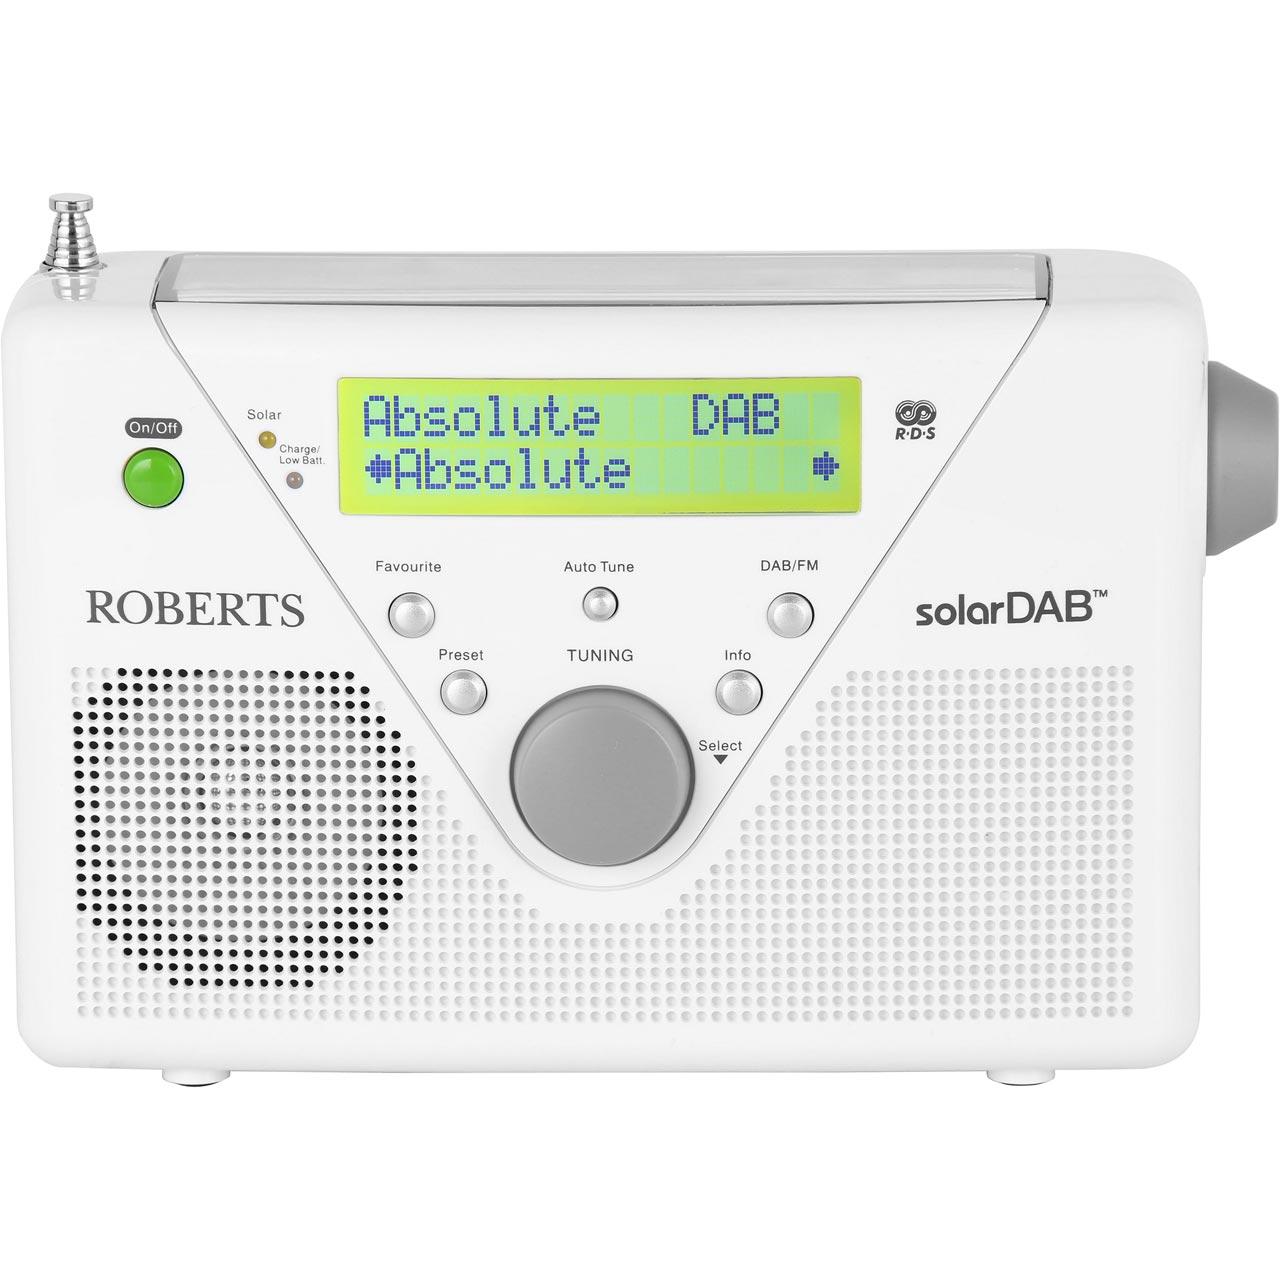 Solardab2w Roberts Radio Digital Kit Fm Display Frequensi Counter Untuk Tuner